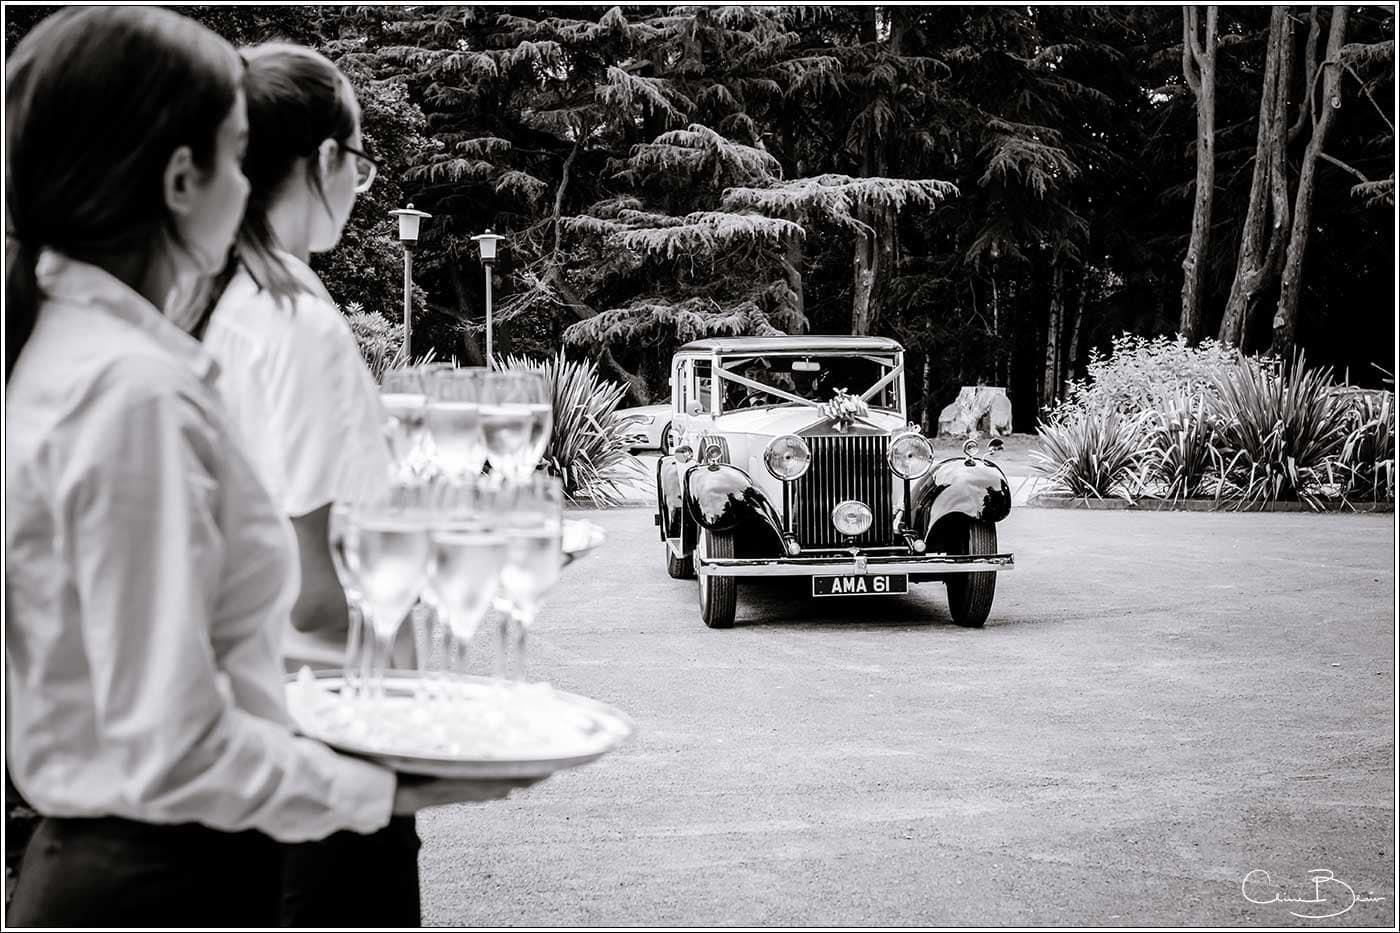 Bridal car arriving at Hampton Manor-by Hampton manor wedding photographer Clive Blair Photography